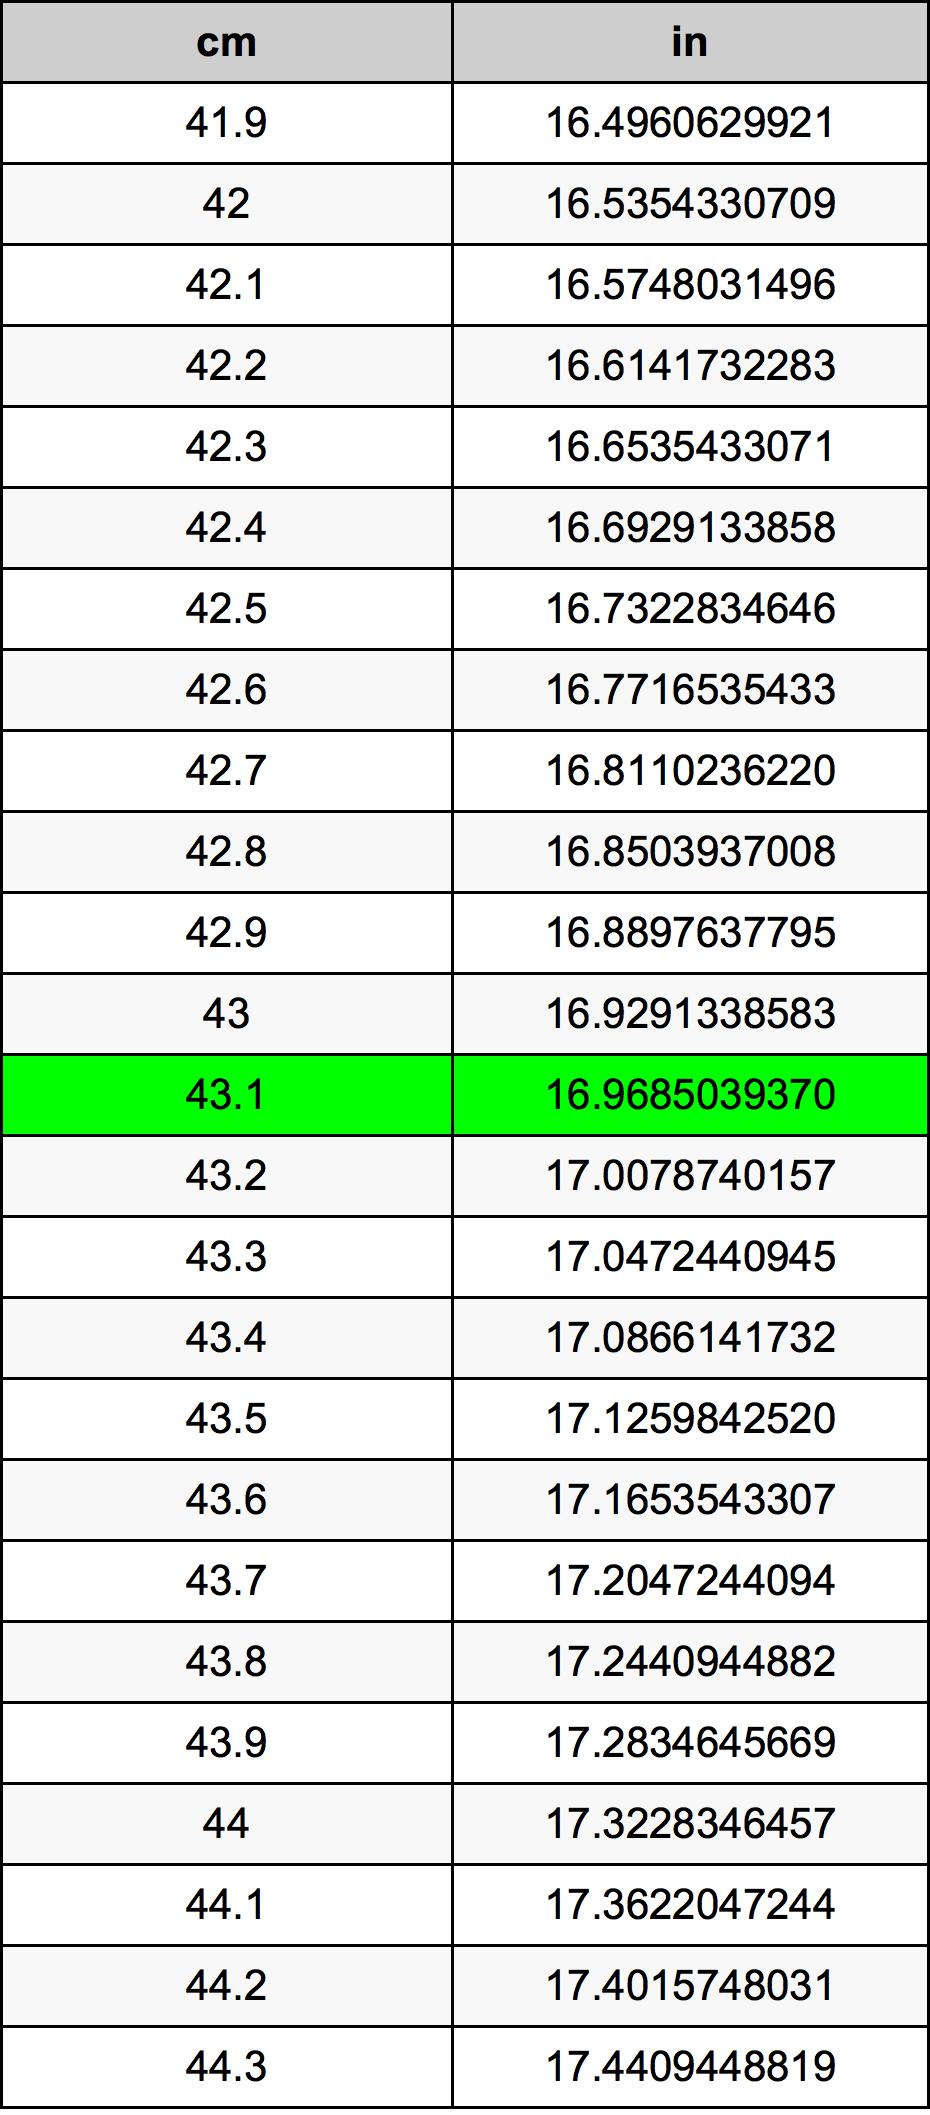 43.1 Centimeter konverteringstabellen